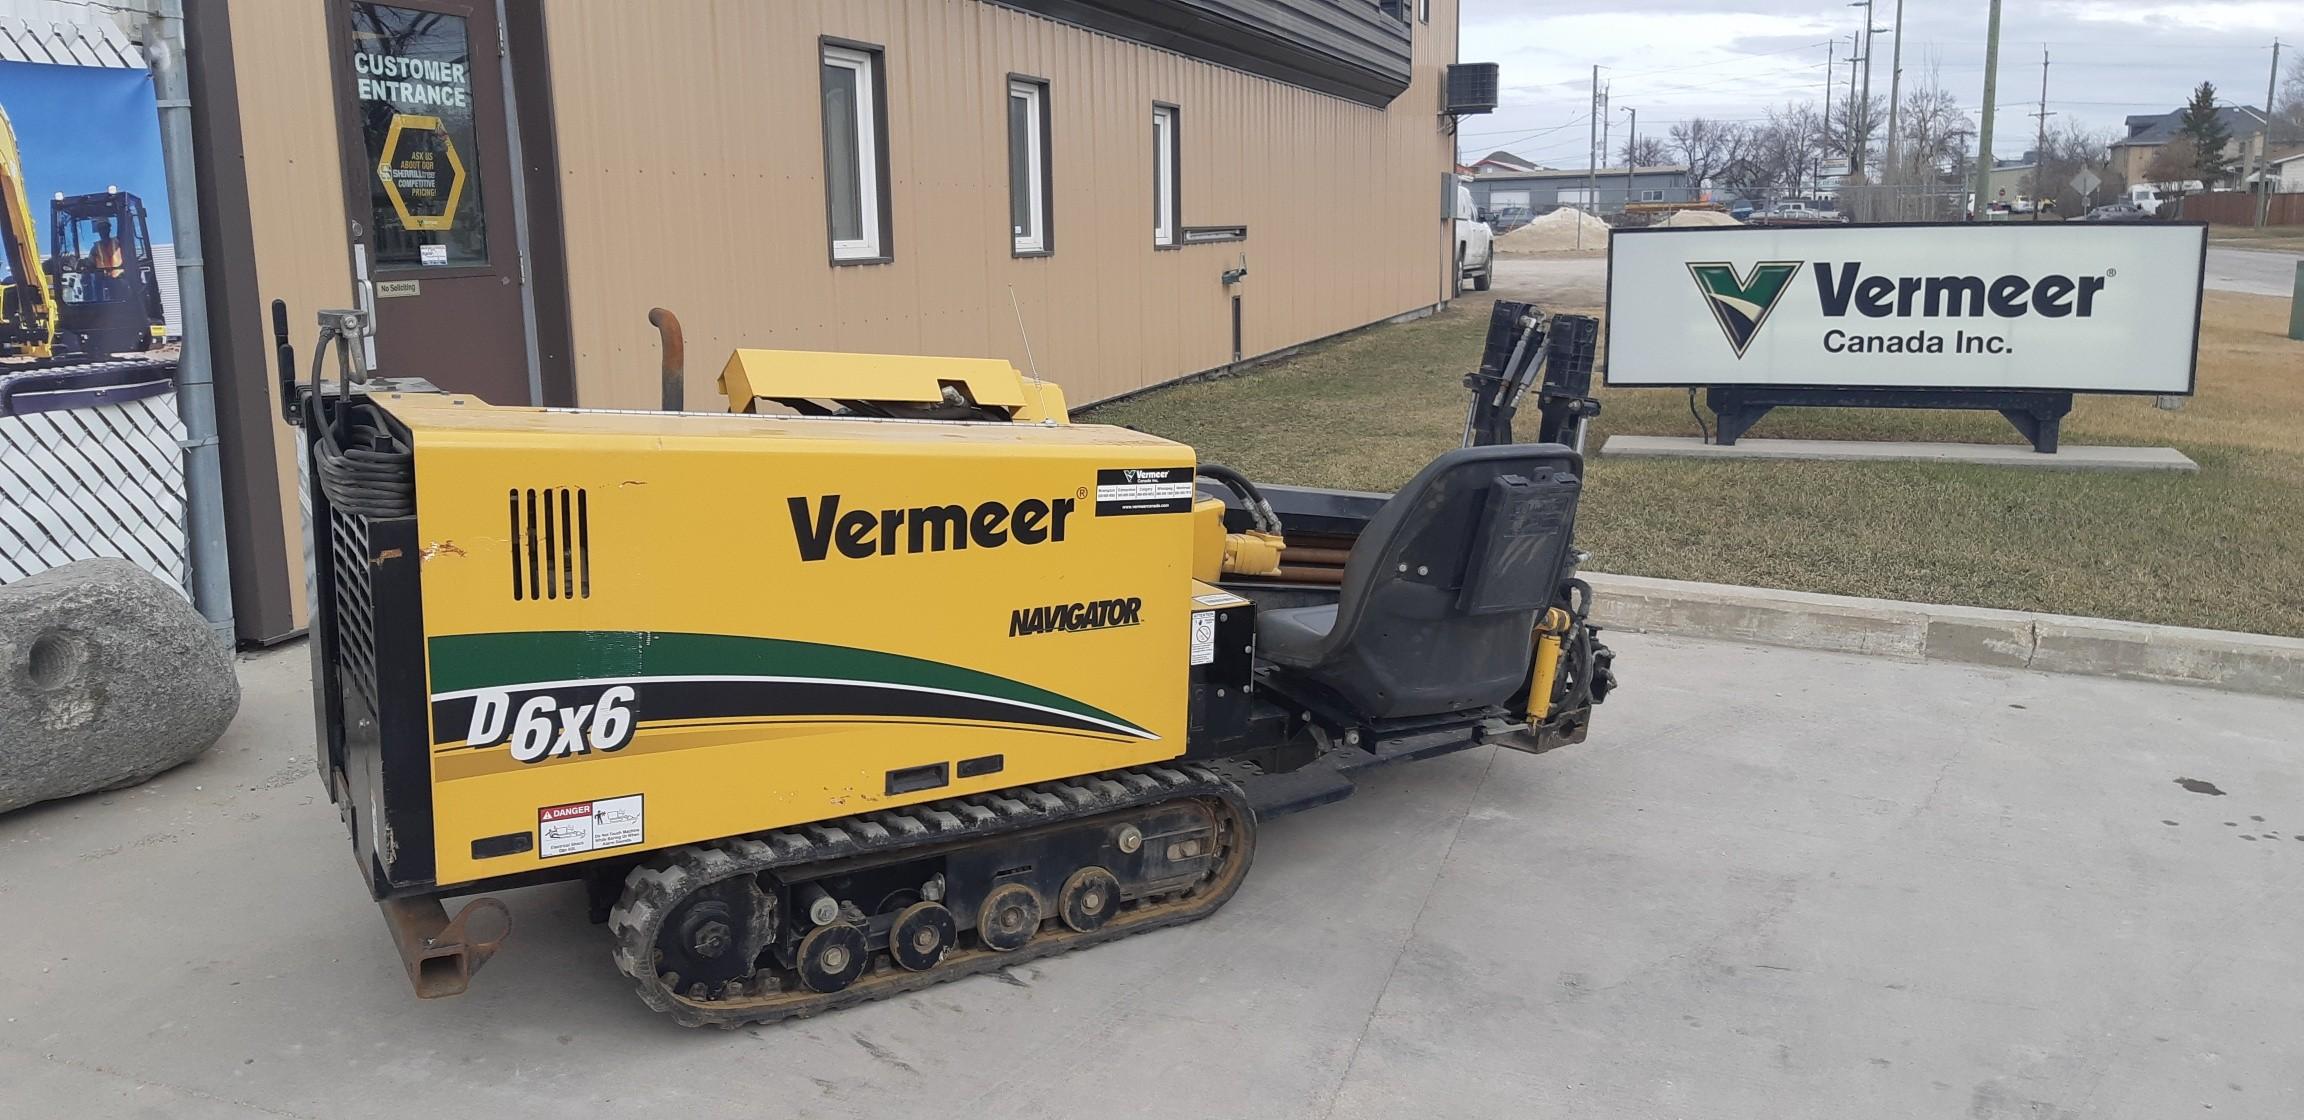 Used, 2013, Vermeer, D6x6, Boring / Drilling Machines